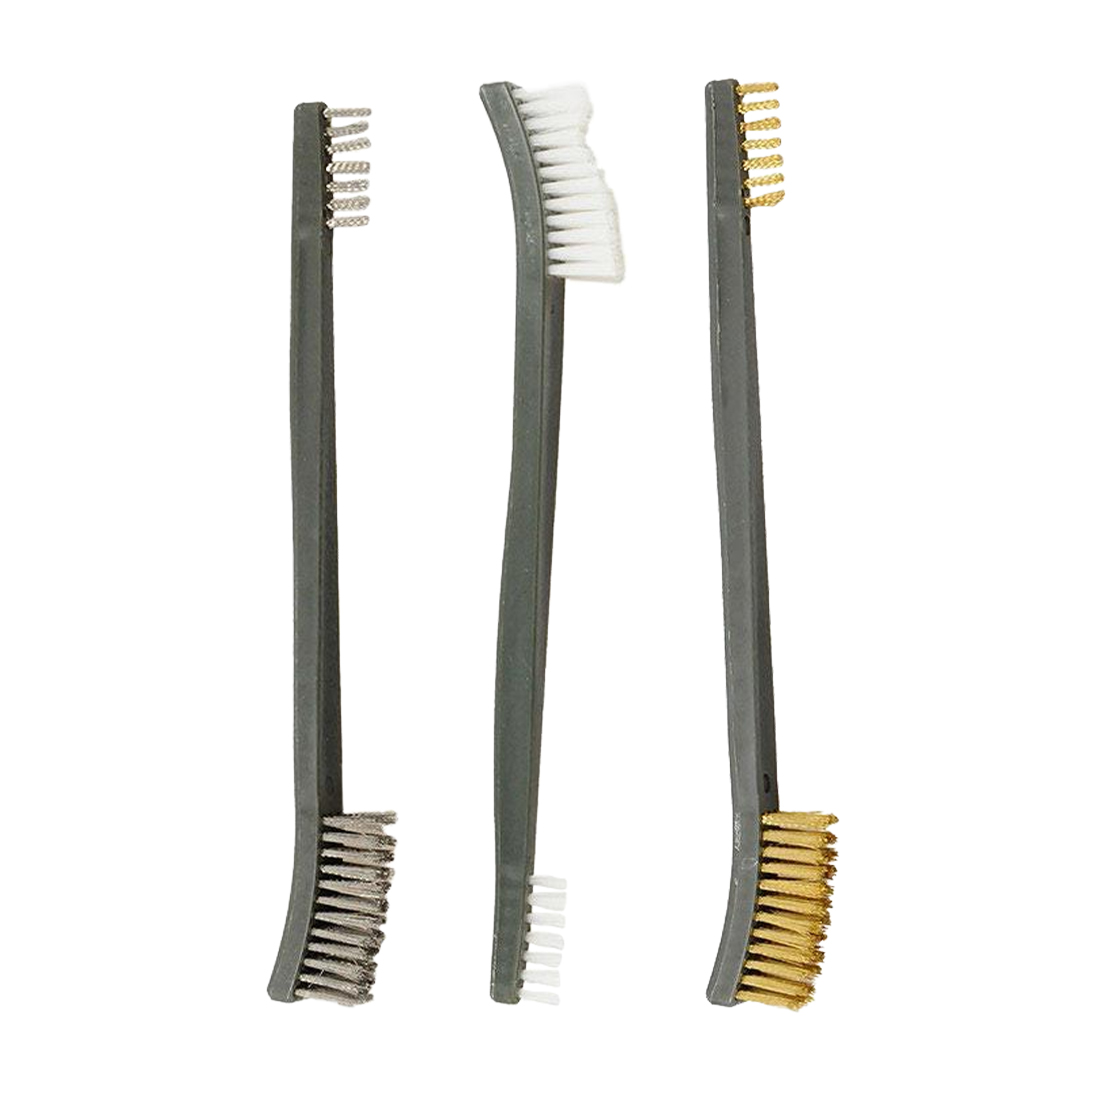 Hot Sale 3pcs/set 17cm Steel / Nylon / Brass Brush Suitable For Cleaning Paint / Rust / Dirt